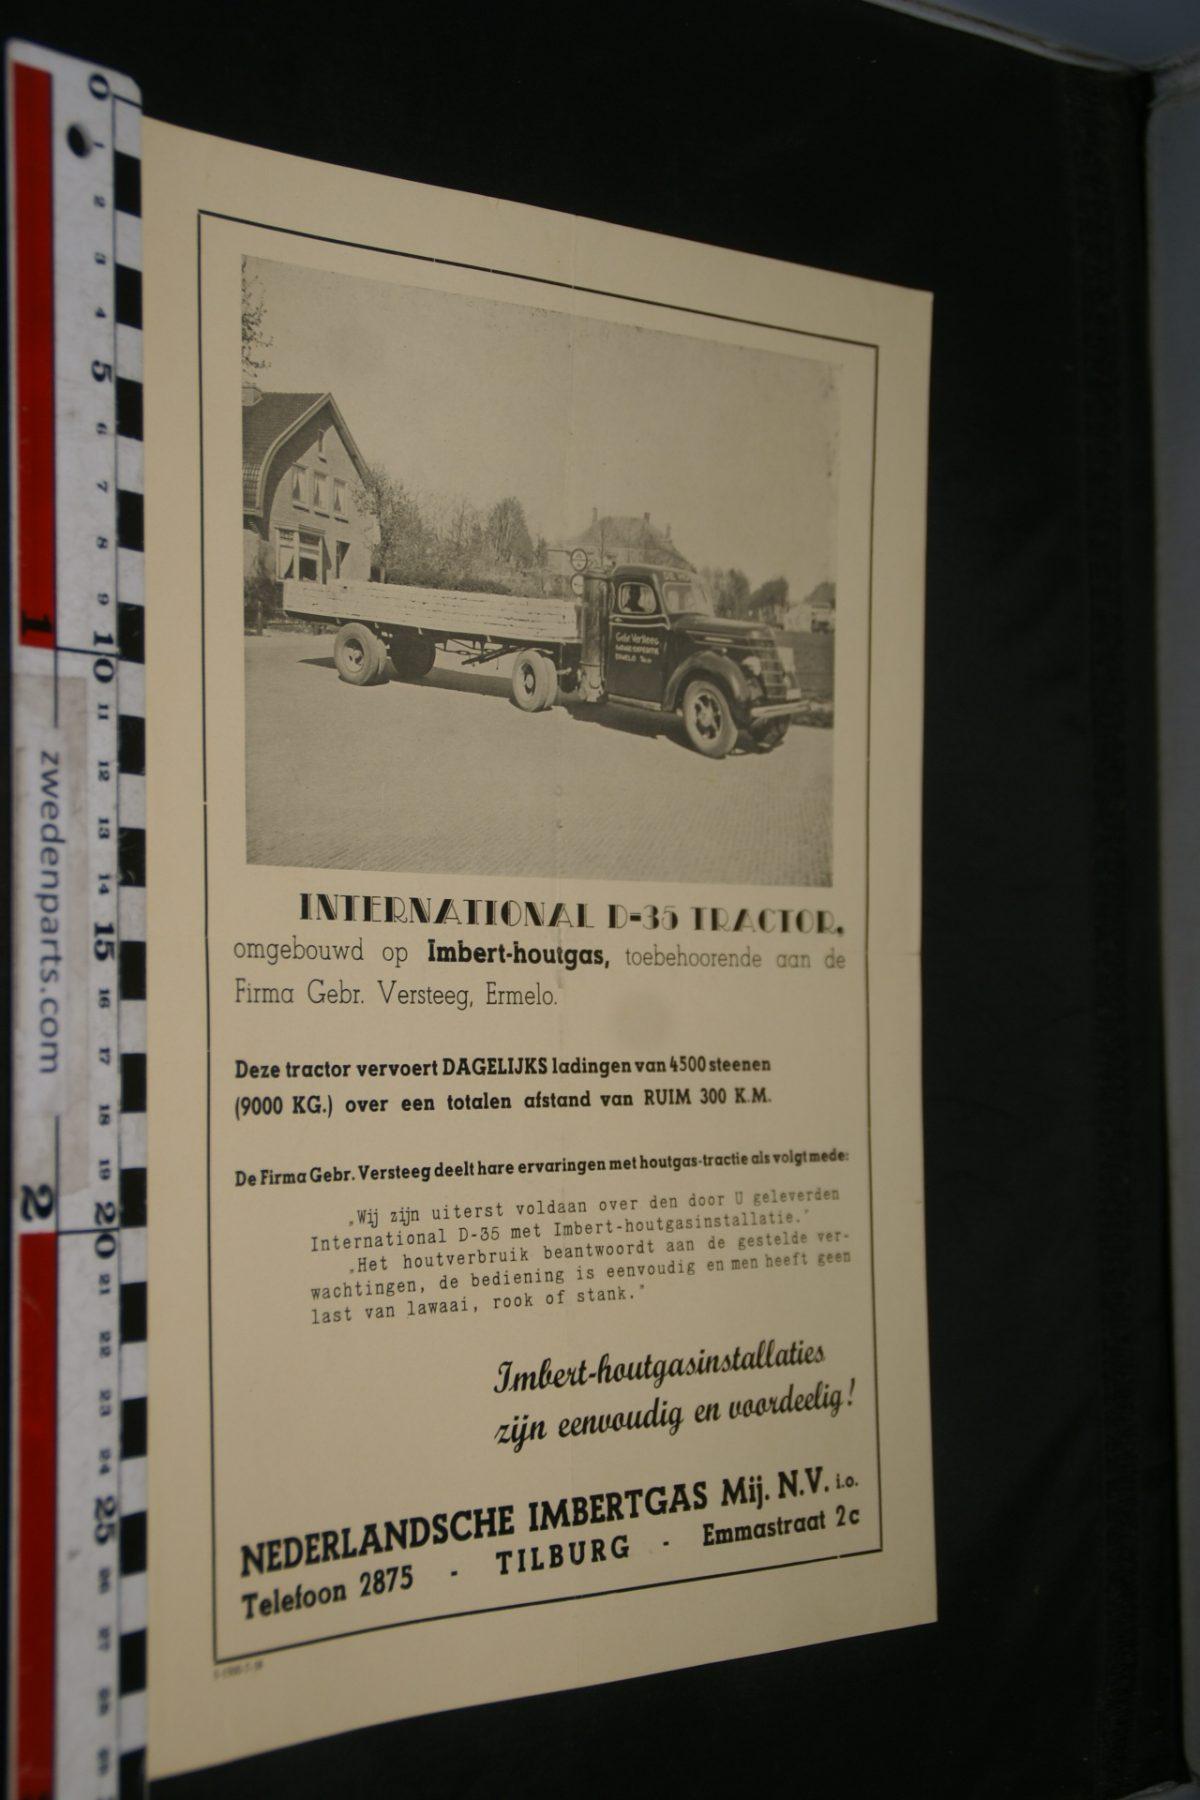 DSC05320 1938 brochure International D-35 Tractor Houtgas